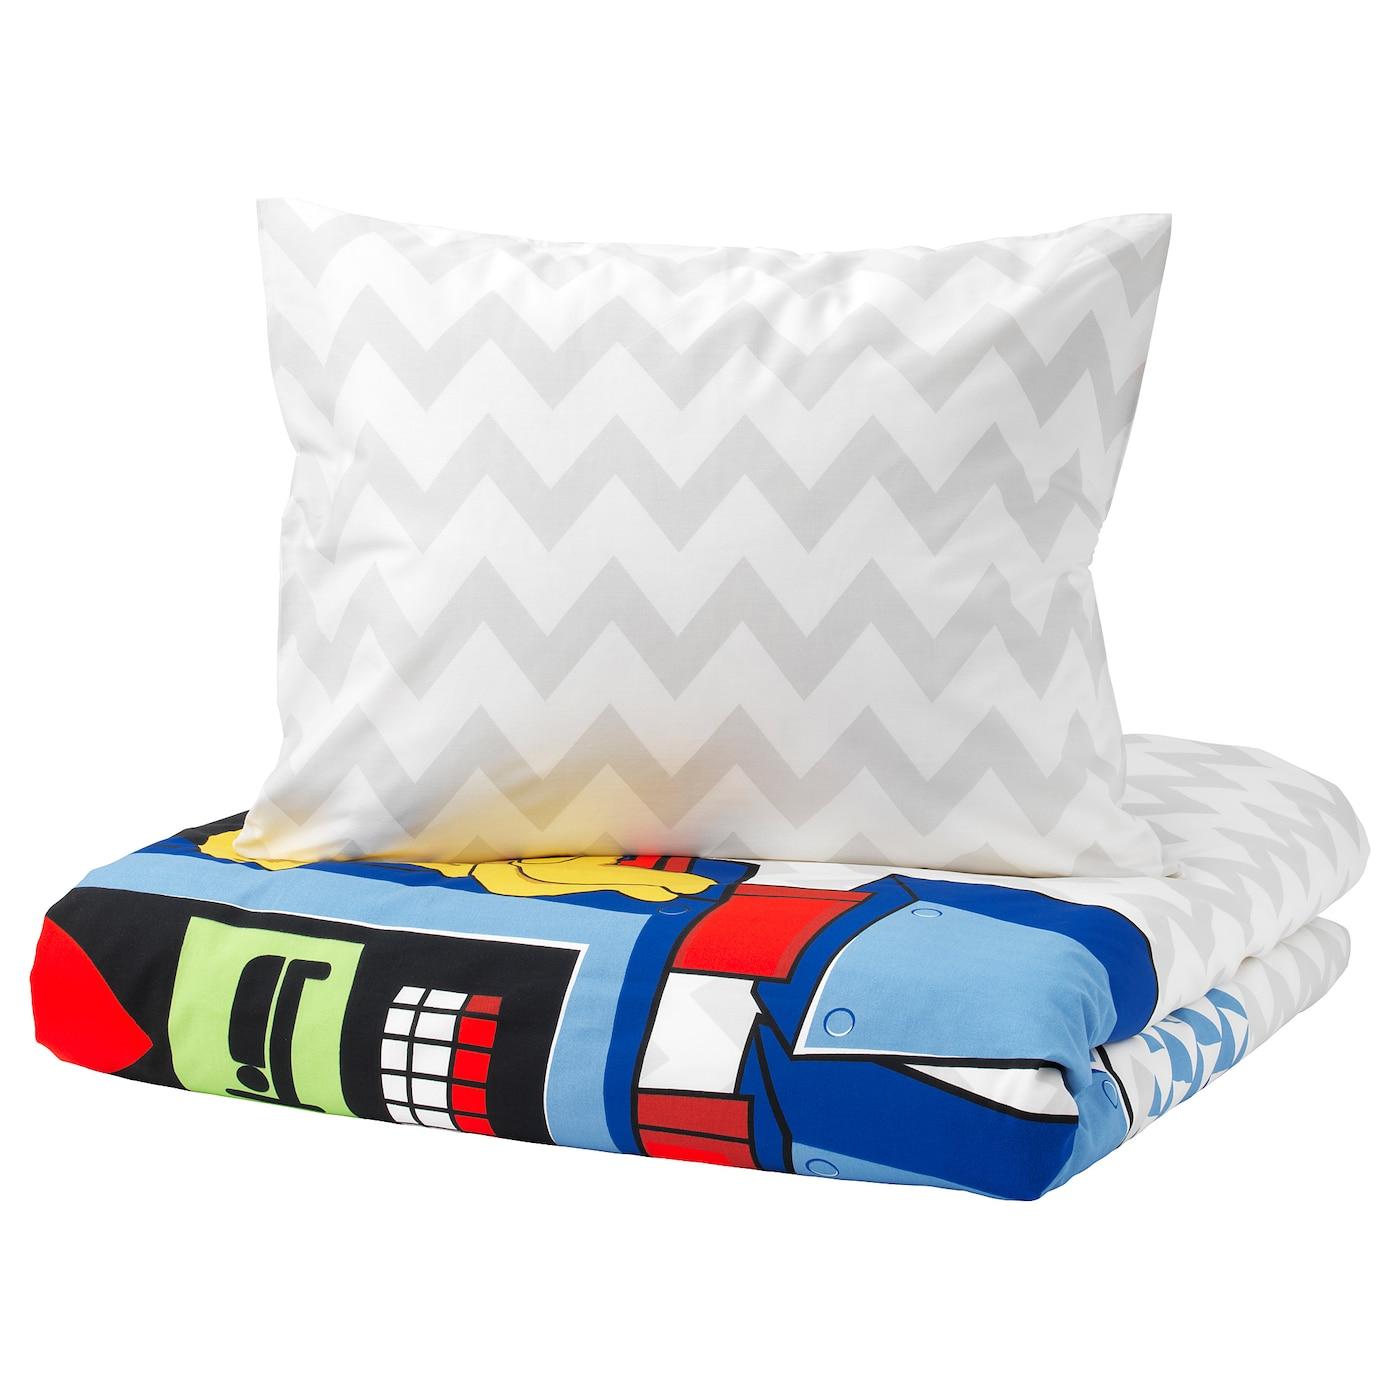 linge de lit enfant couette drap enfant ikea. Black Bedroom Furniture Sets. Home Design Ideas